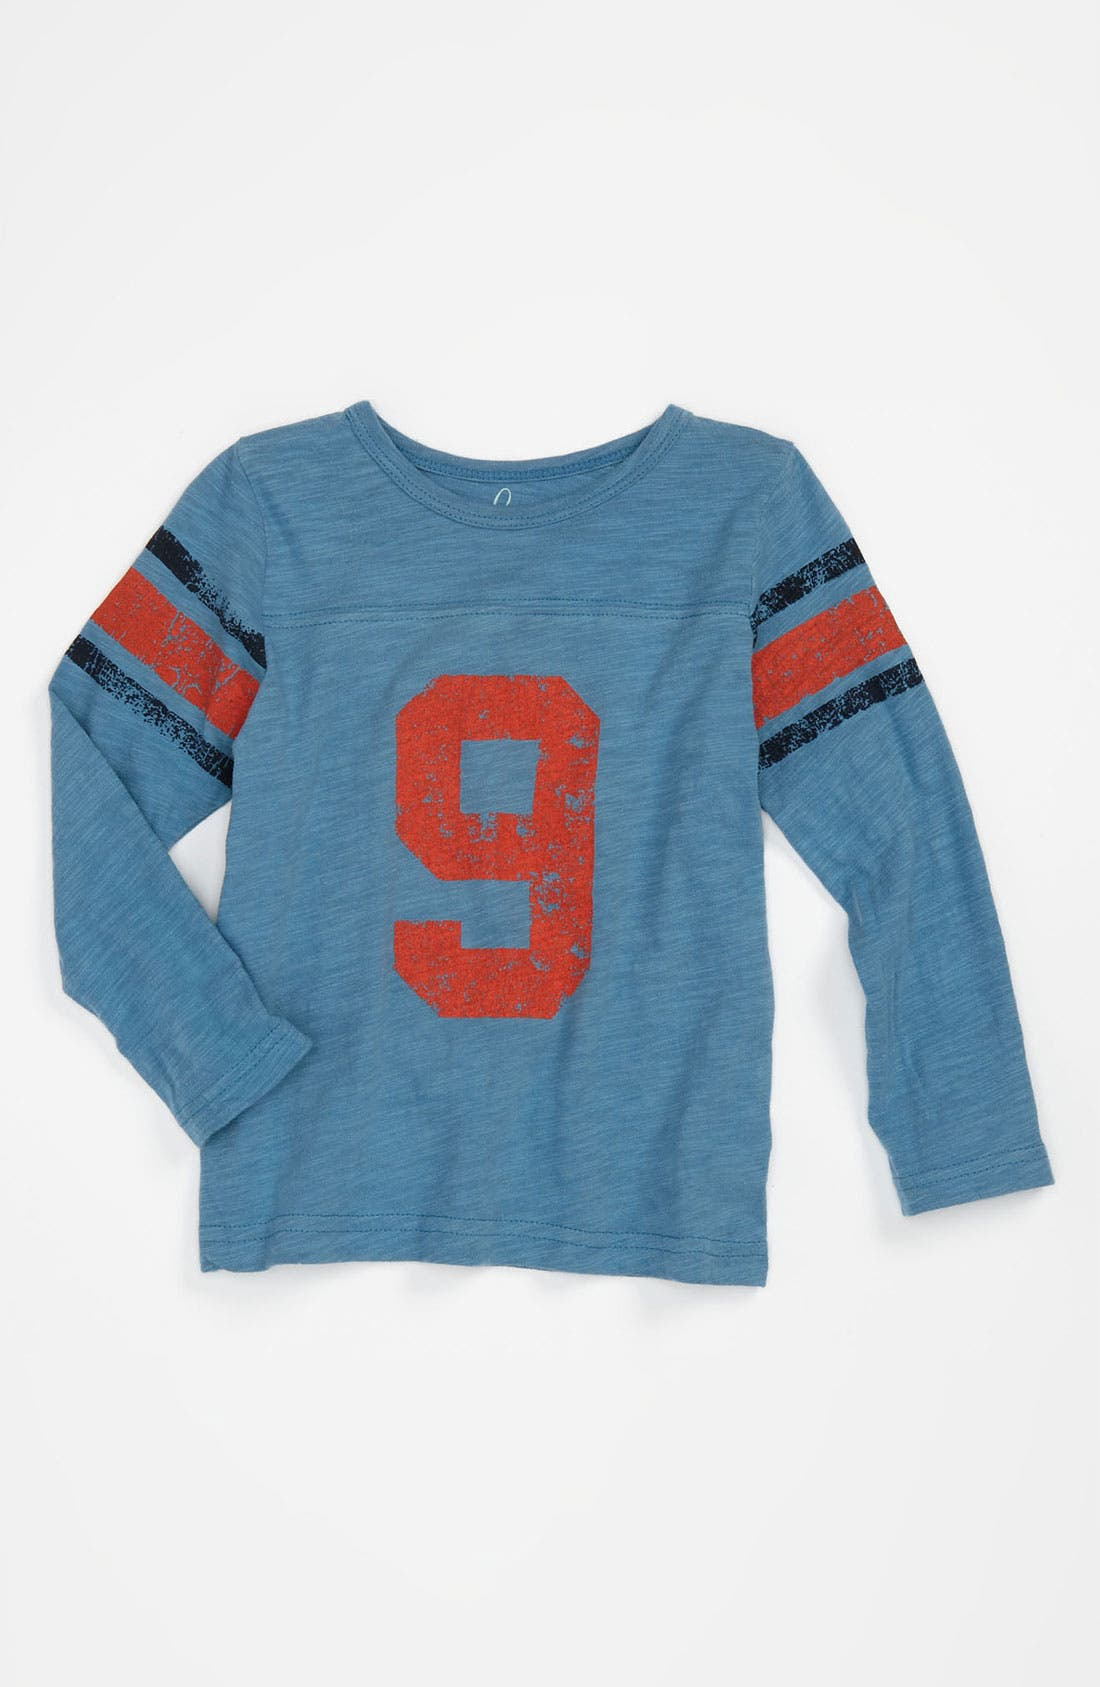 Main Image - Peek Long Sleeve Jersey Top (Infant)